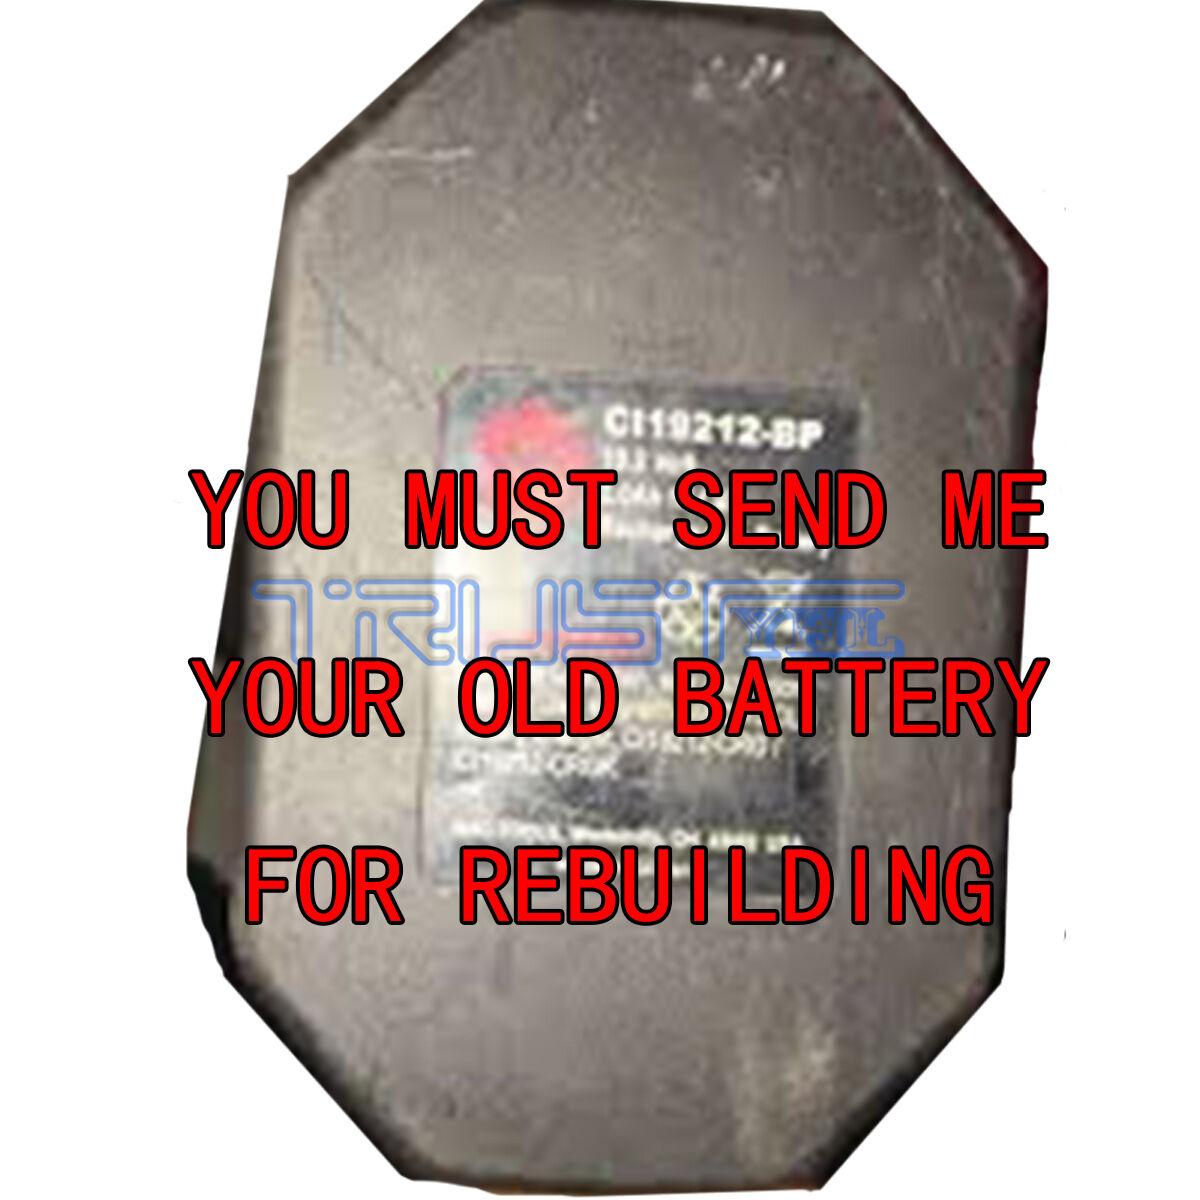 Re-build service for MAC TOOL 19.2 VOLT BATTERY CI19212-BP NI-MH  3.0